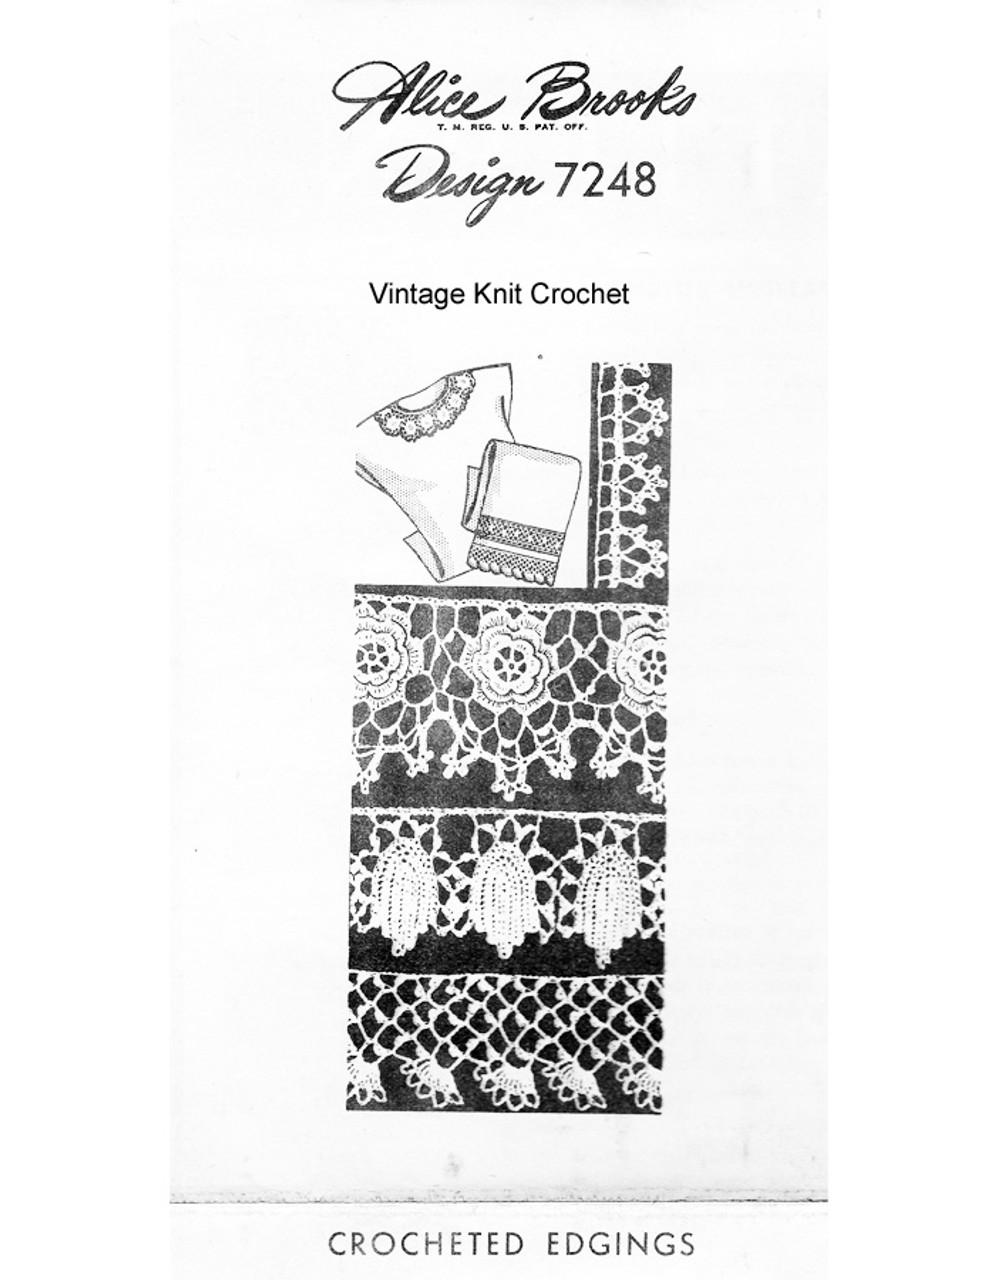 Edgings Insertion patterns in Irish Crochet, Mail Order 7248